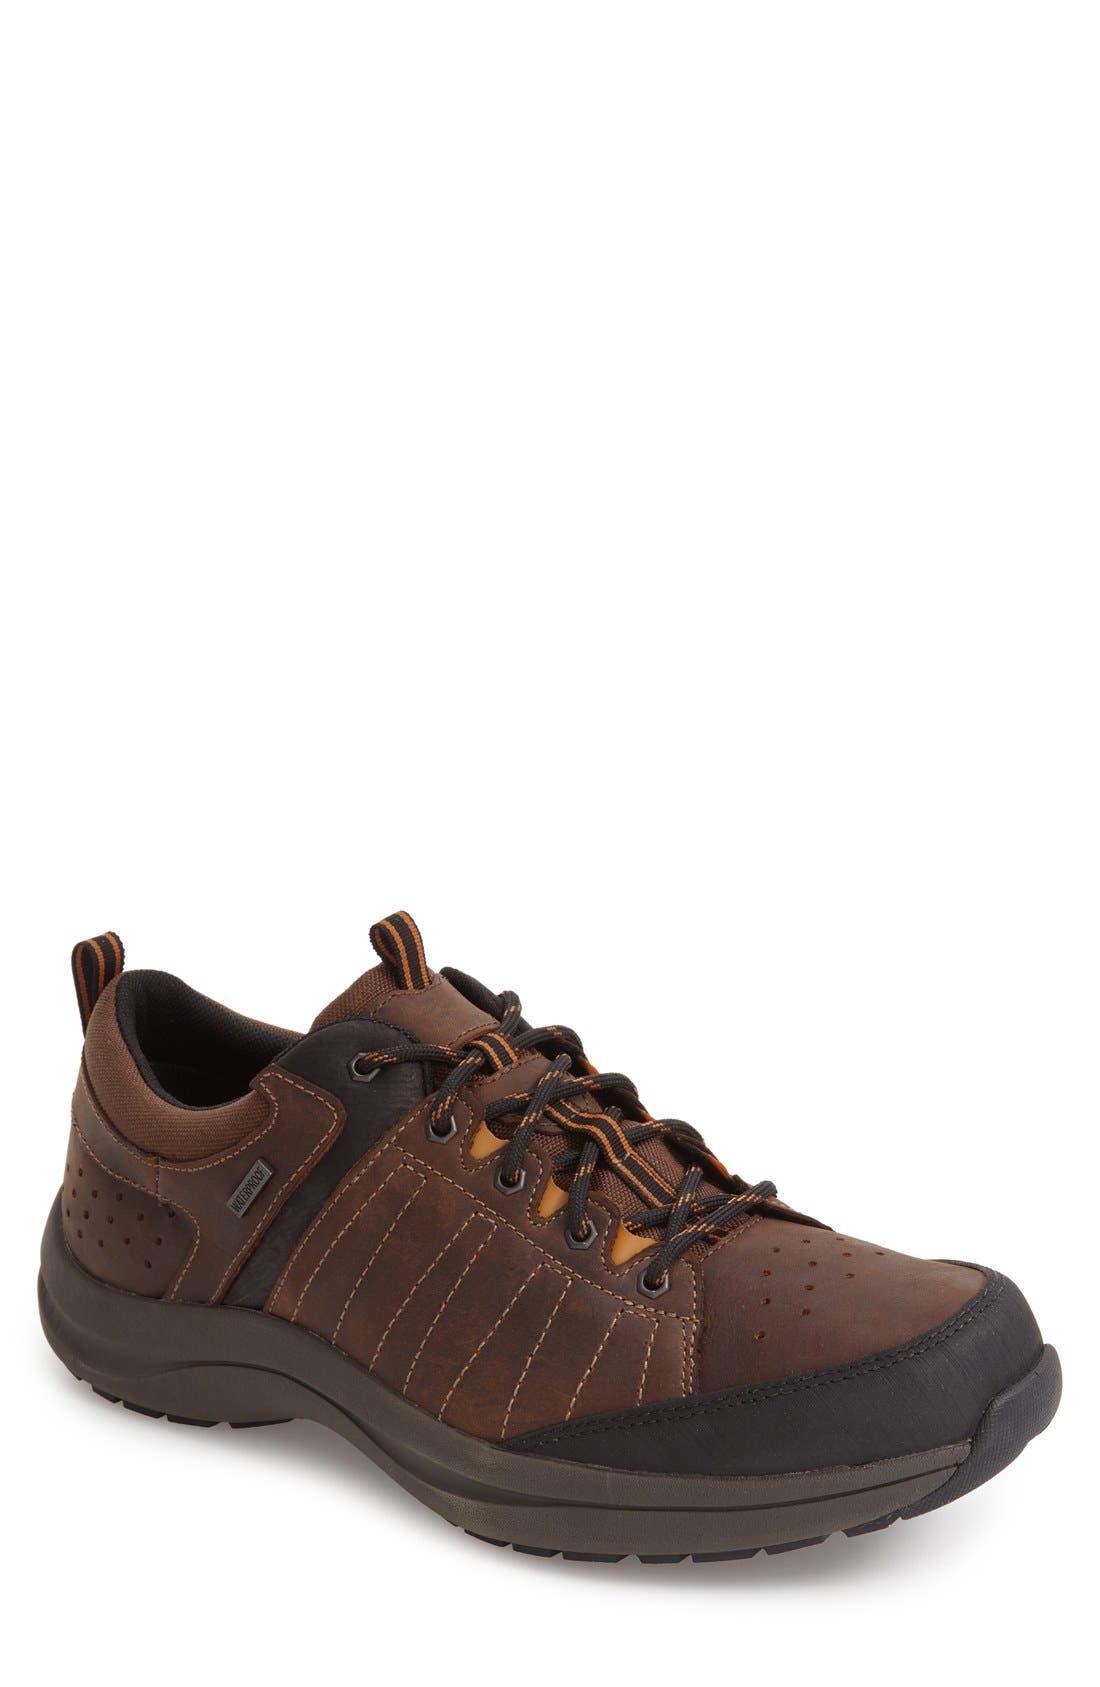 Seth-Dun Waterproof Sneaker,                         Main,                         color, Brown Leather